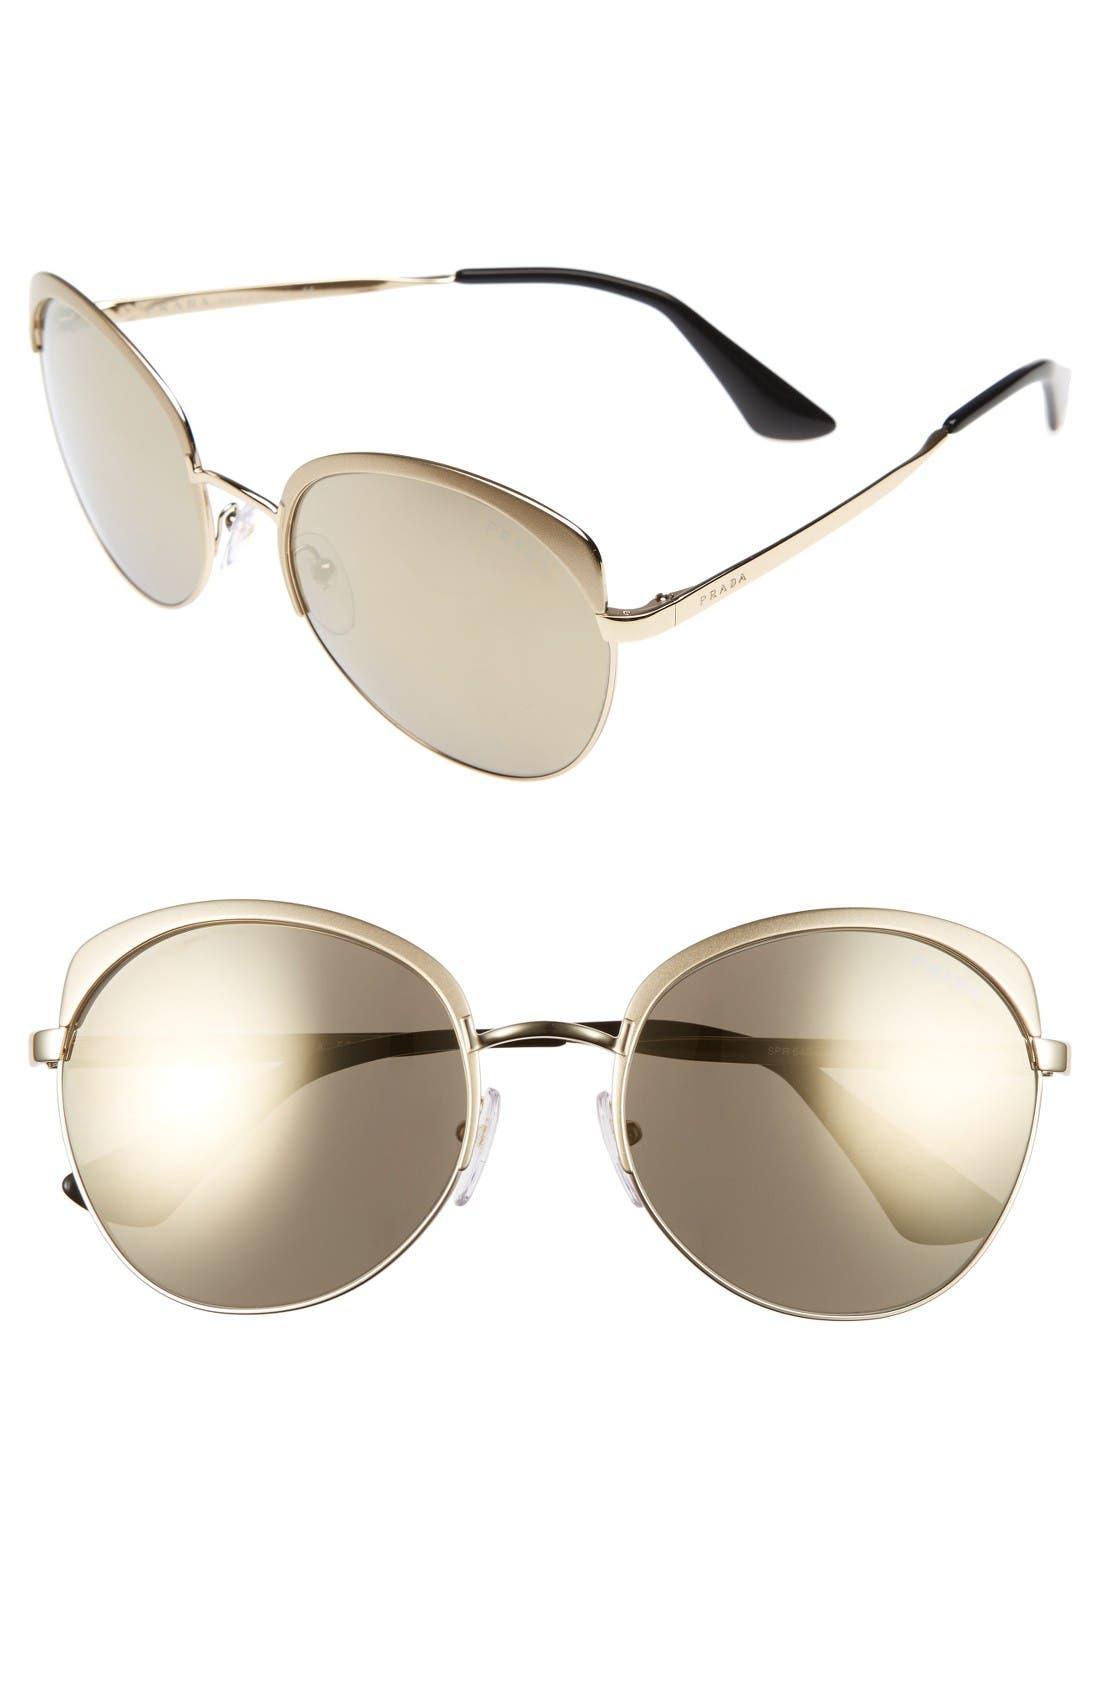 PRADA 59mm Sunglasses